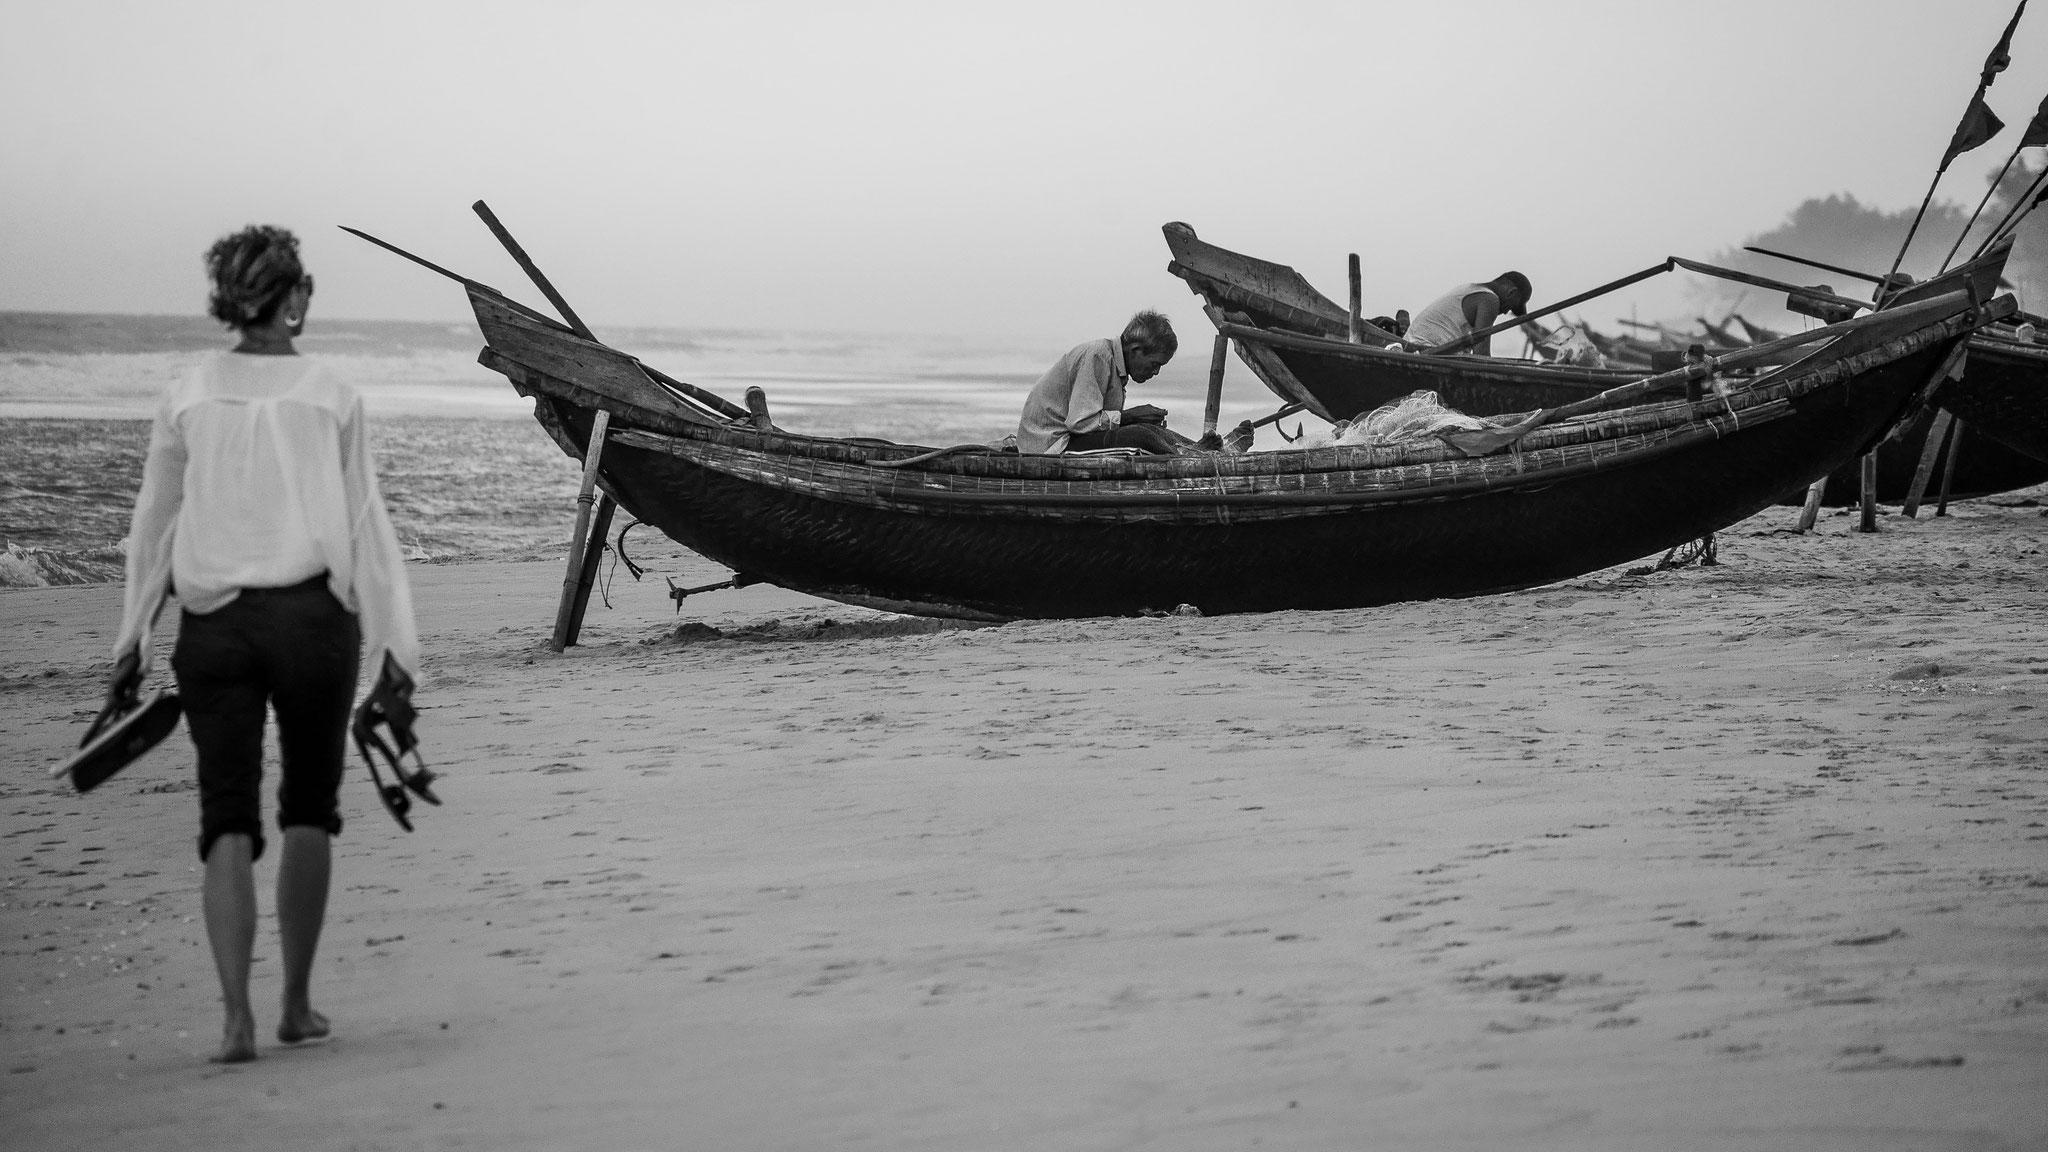 Hue - Thuan An Beach